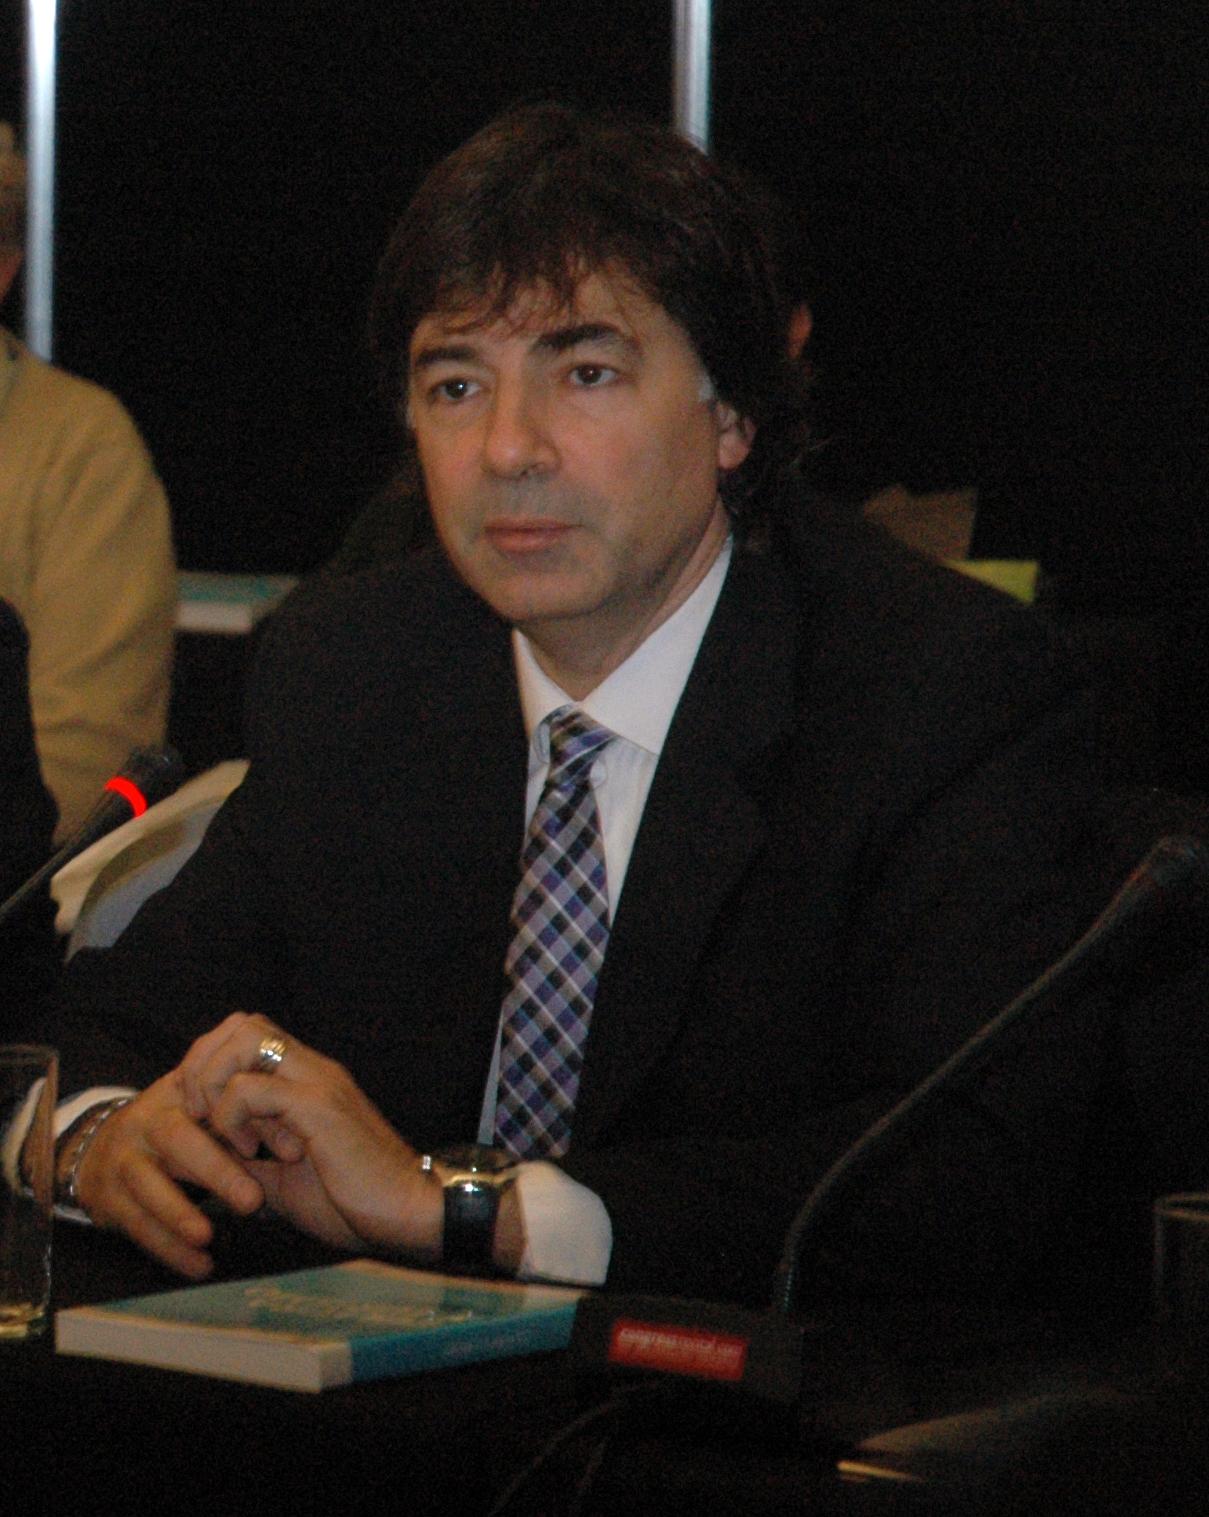 Foto MGP - Pablo Fernandez - Presidente Turismo Mar del Plata